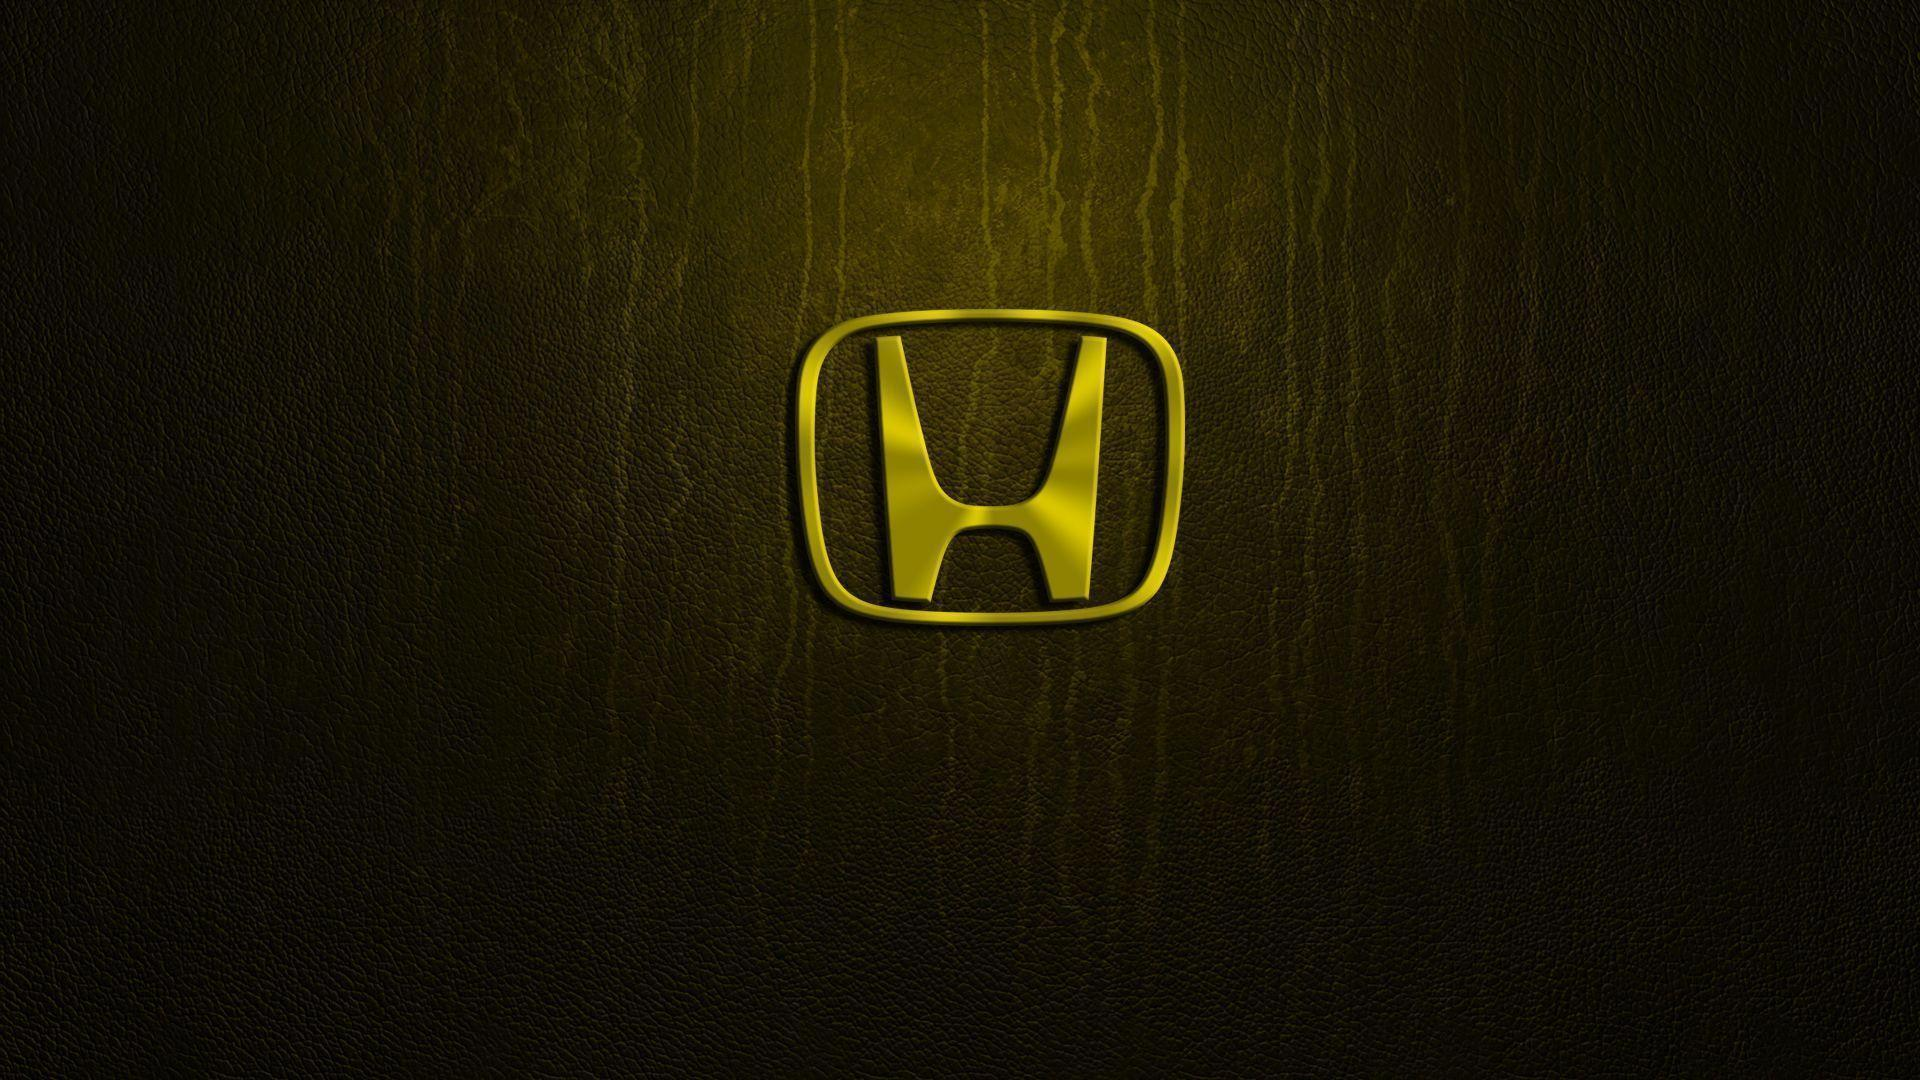 Honda Logo HD Wallpaper 1920x1080